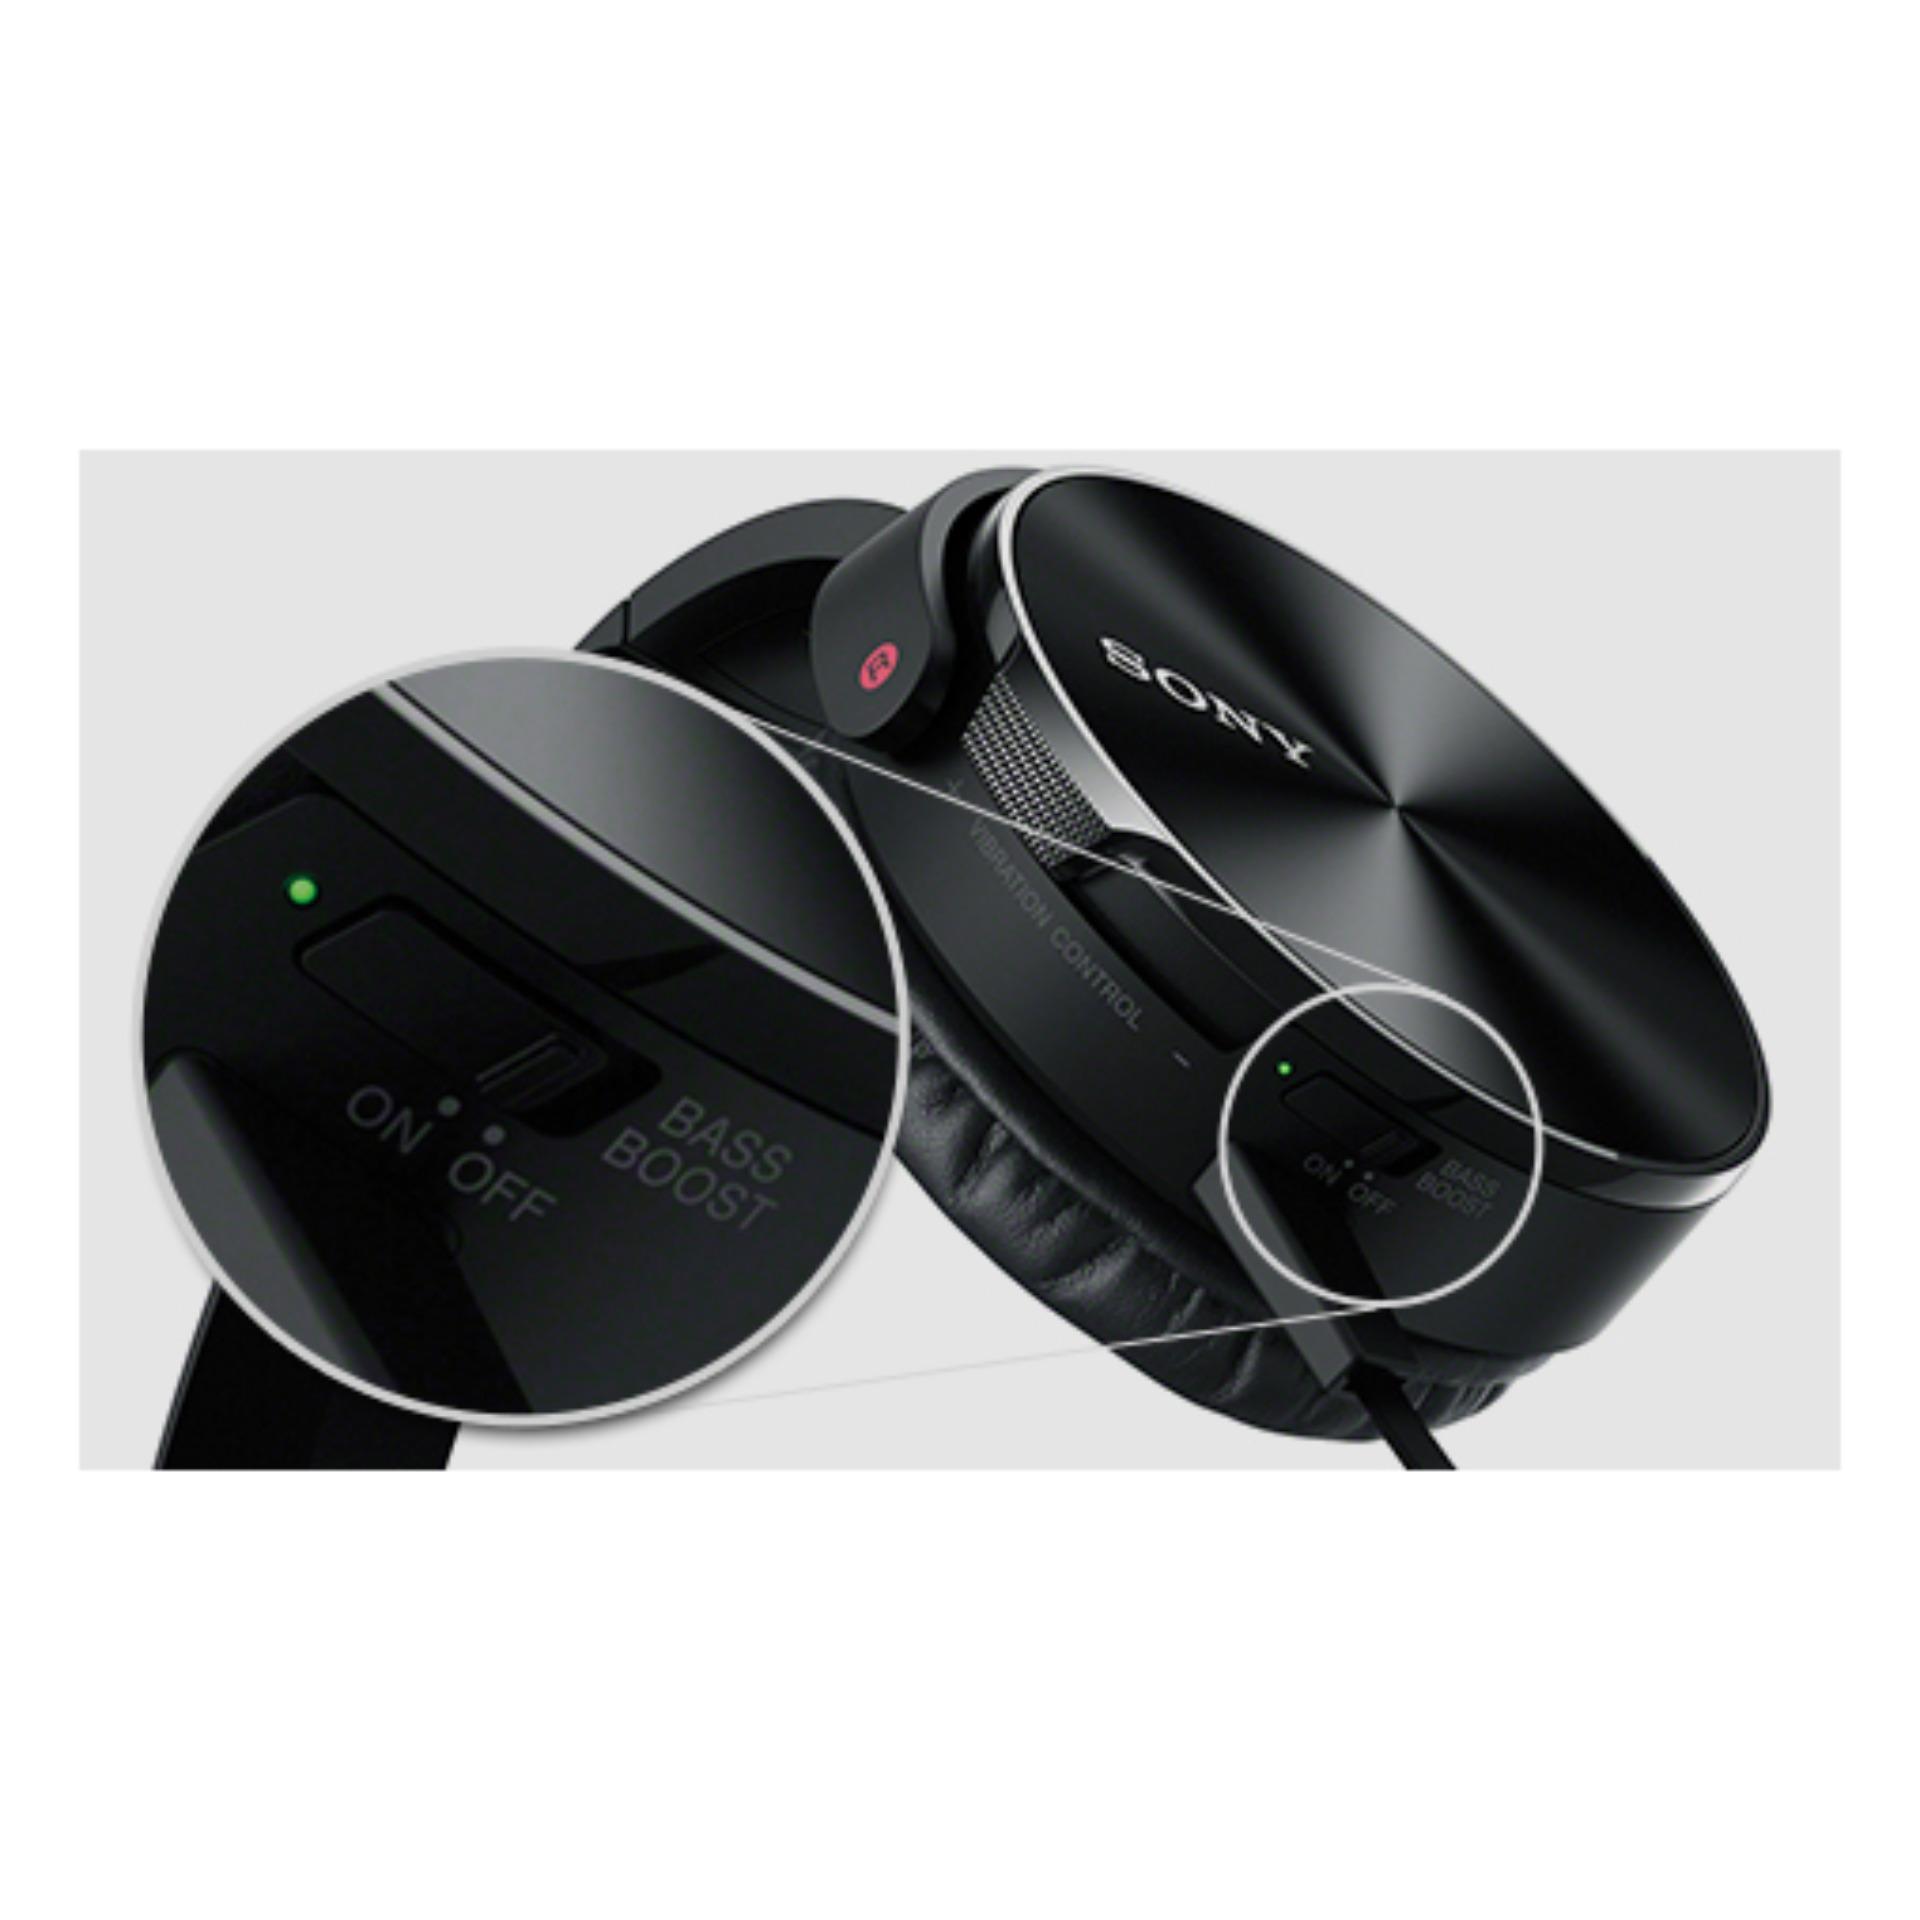 Swiss Navy Jam Tangan Pria Hitam Leather Strap Sn 4338 Daftar Rosegold 8647 Source Sony Headphone Mdr Xb450ap Audio Ekstra Bass On Ear Ori